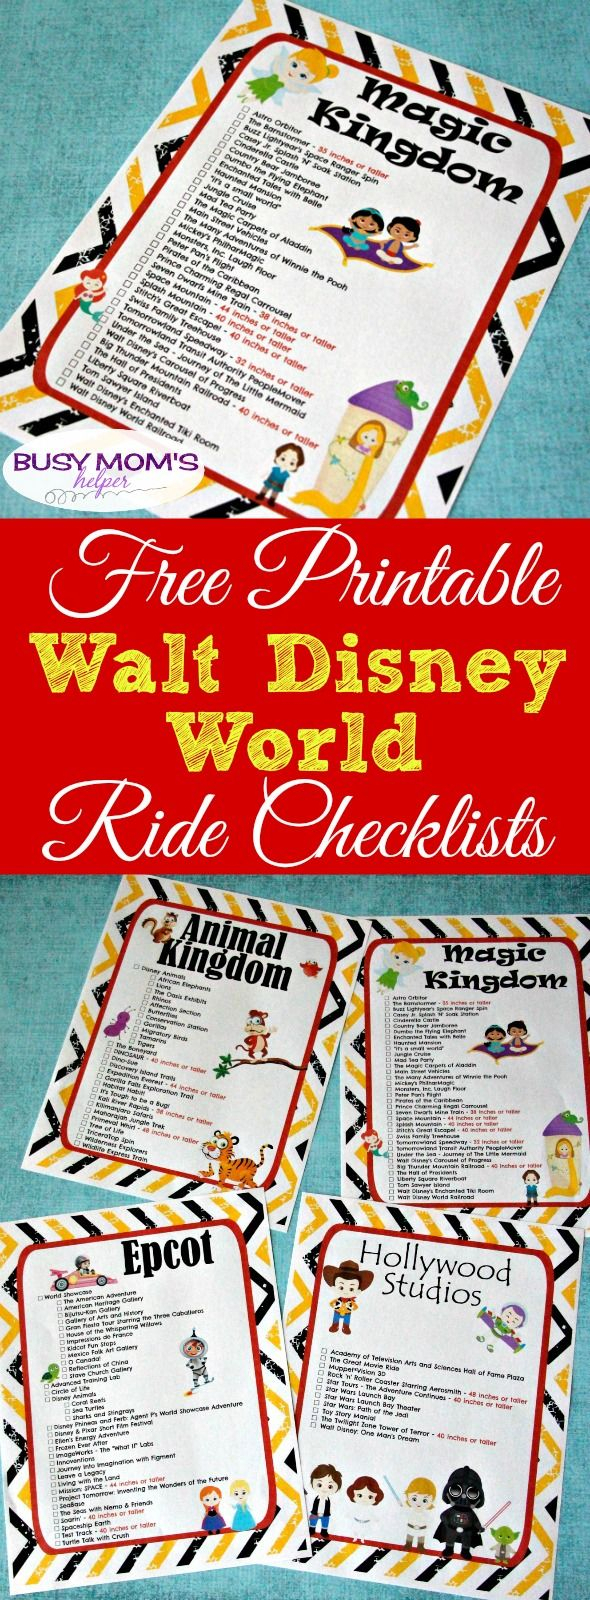 Free Printable Walt Disney World Ride Checklists | Disney